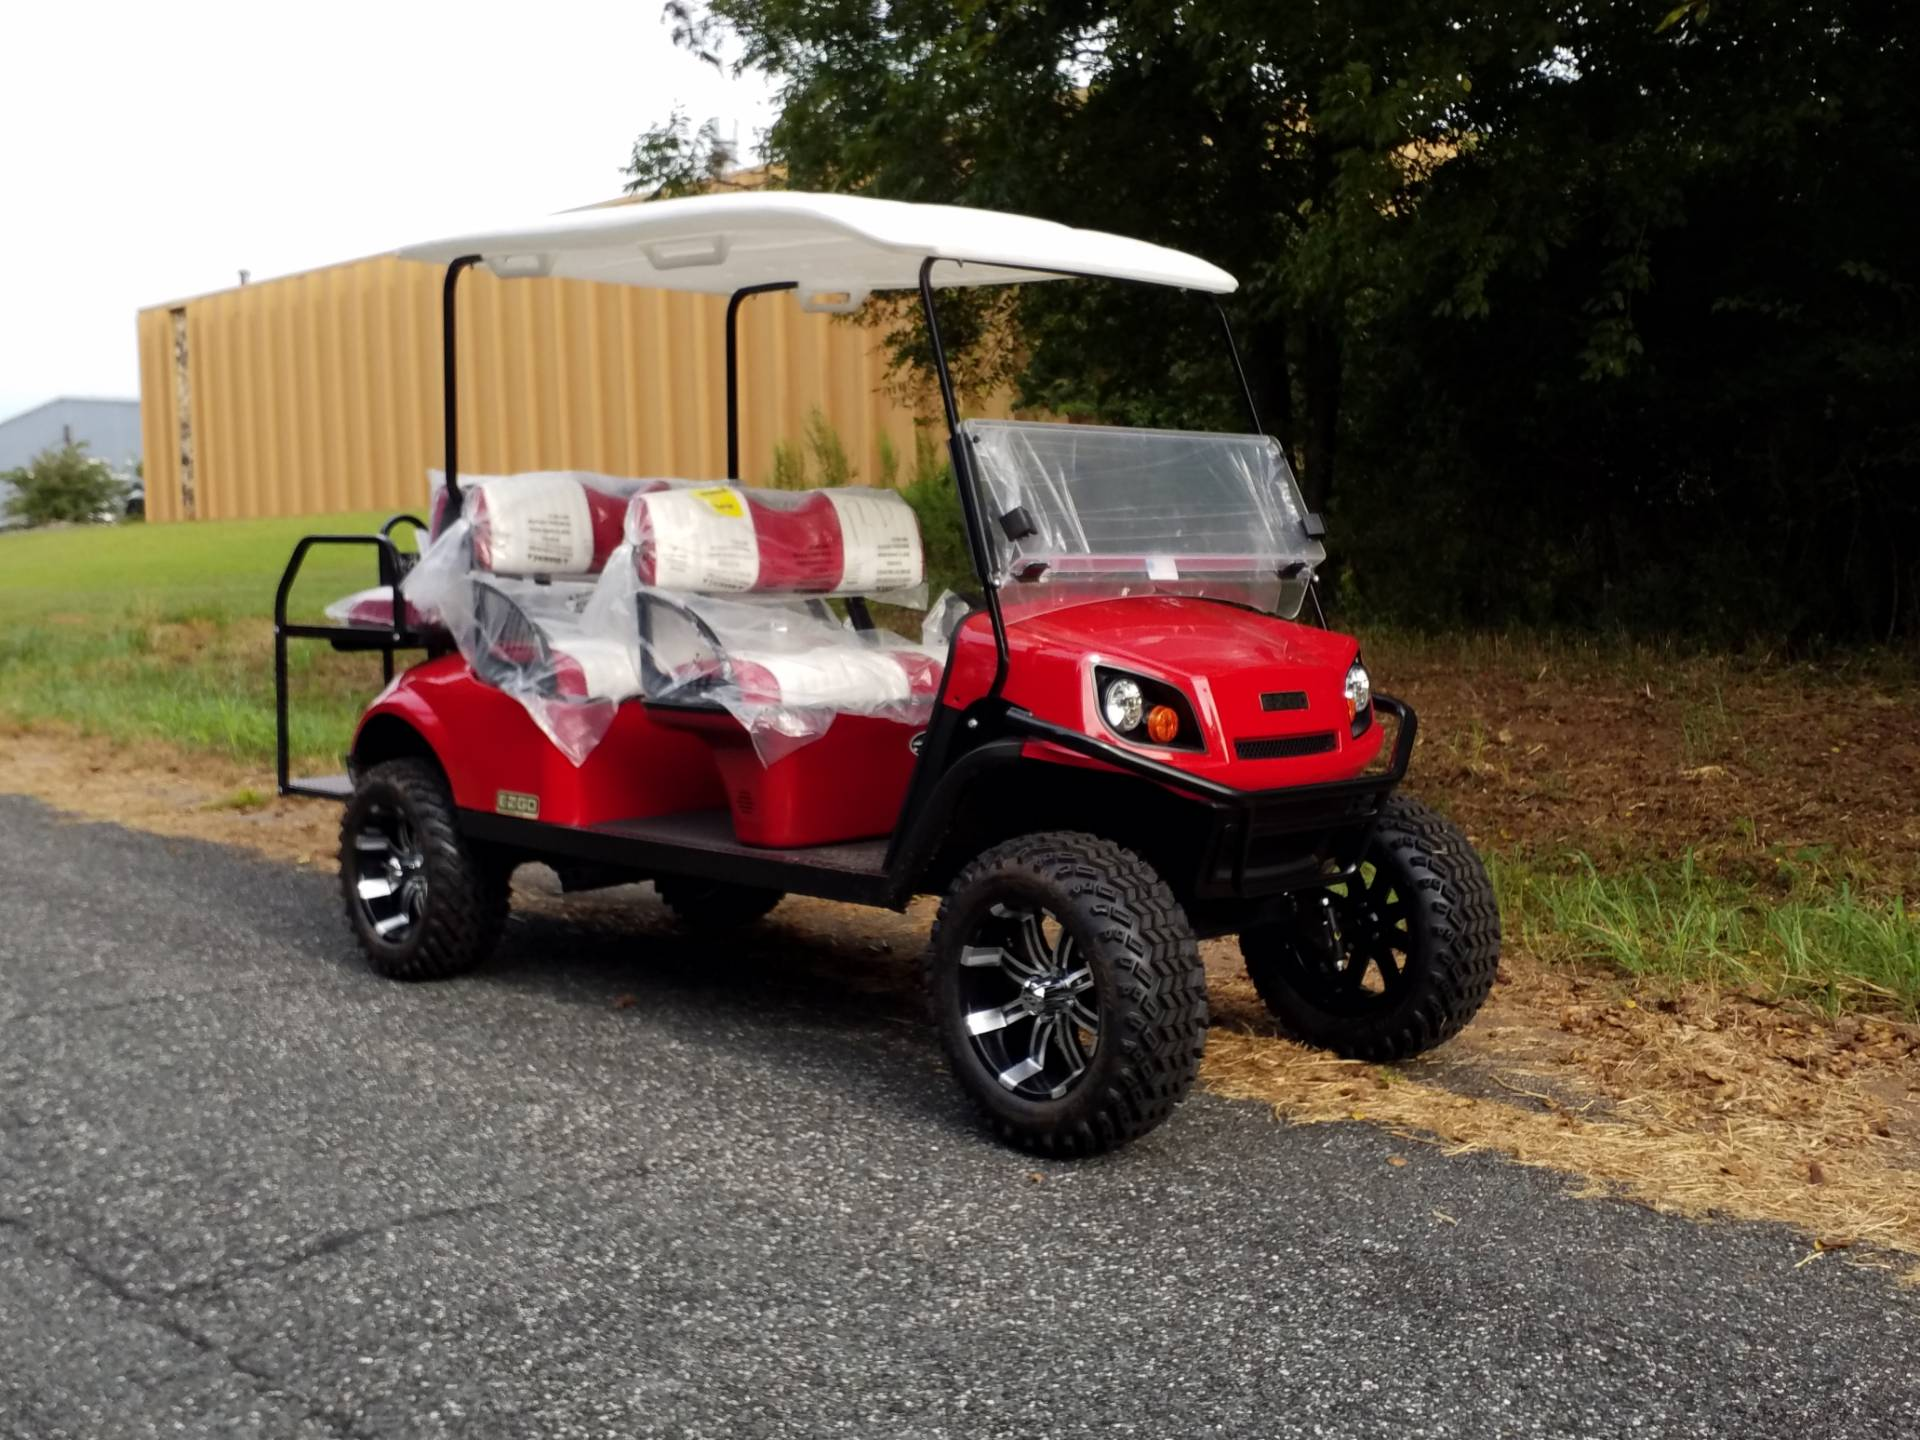 New 2019 E-Z-Go Express L6 Gas Golf Carts in Covington, GA   Stock Golf Carts Ez Go Differential Oil on ez go valor, gas powered ez go carts, used carts, lifted ezgo txt carts, ez go utility cart, ez go product, ez go solenoid troubleshooting, ez go cars, ez go terrain 250g, ez go st 400, ez go clays cart prices, customized go carts, e z go carts, ez go vin numbers, ez go trucks, cushman ez go carts, ez go accessories, ez go the beast, 2014 ezgo valor gas carts, ez go rxv cart,